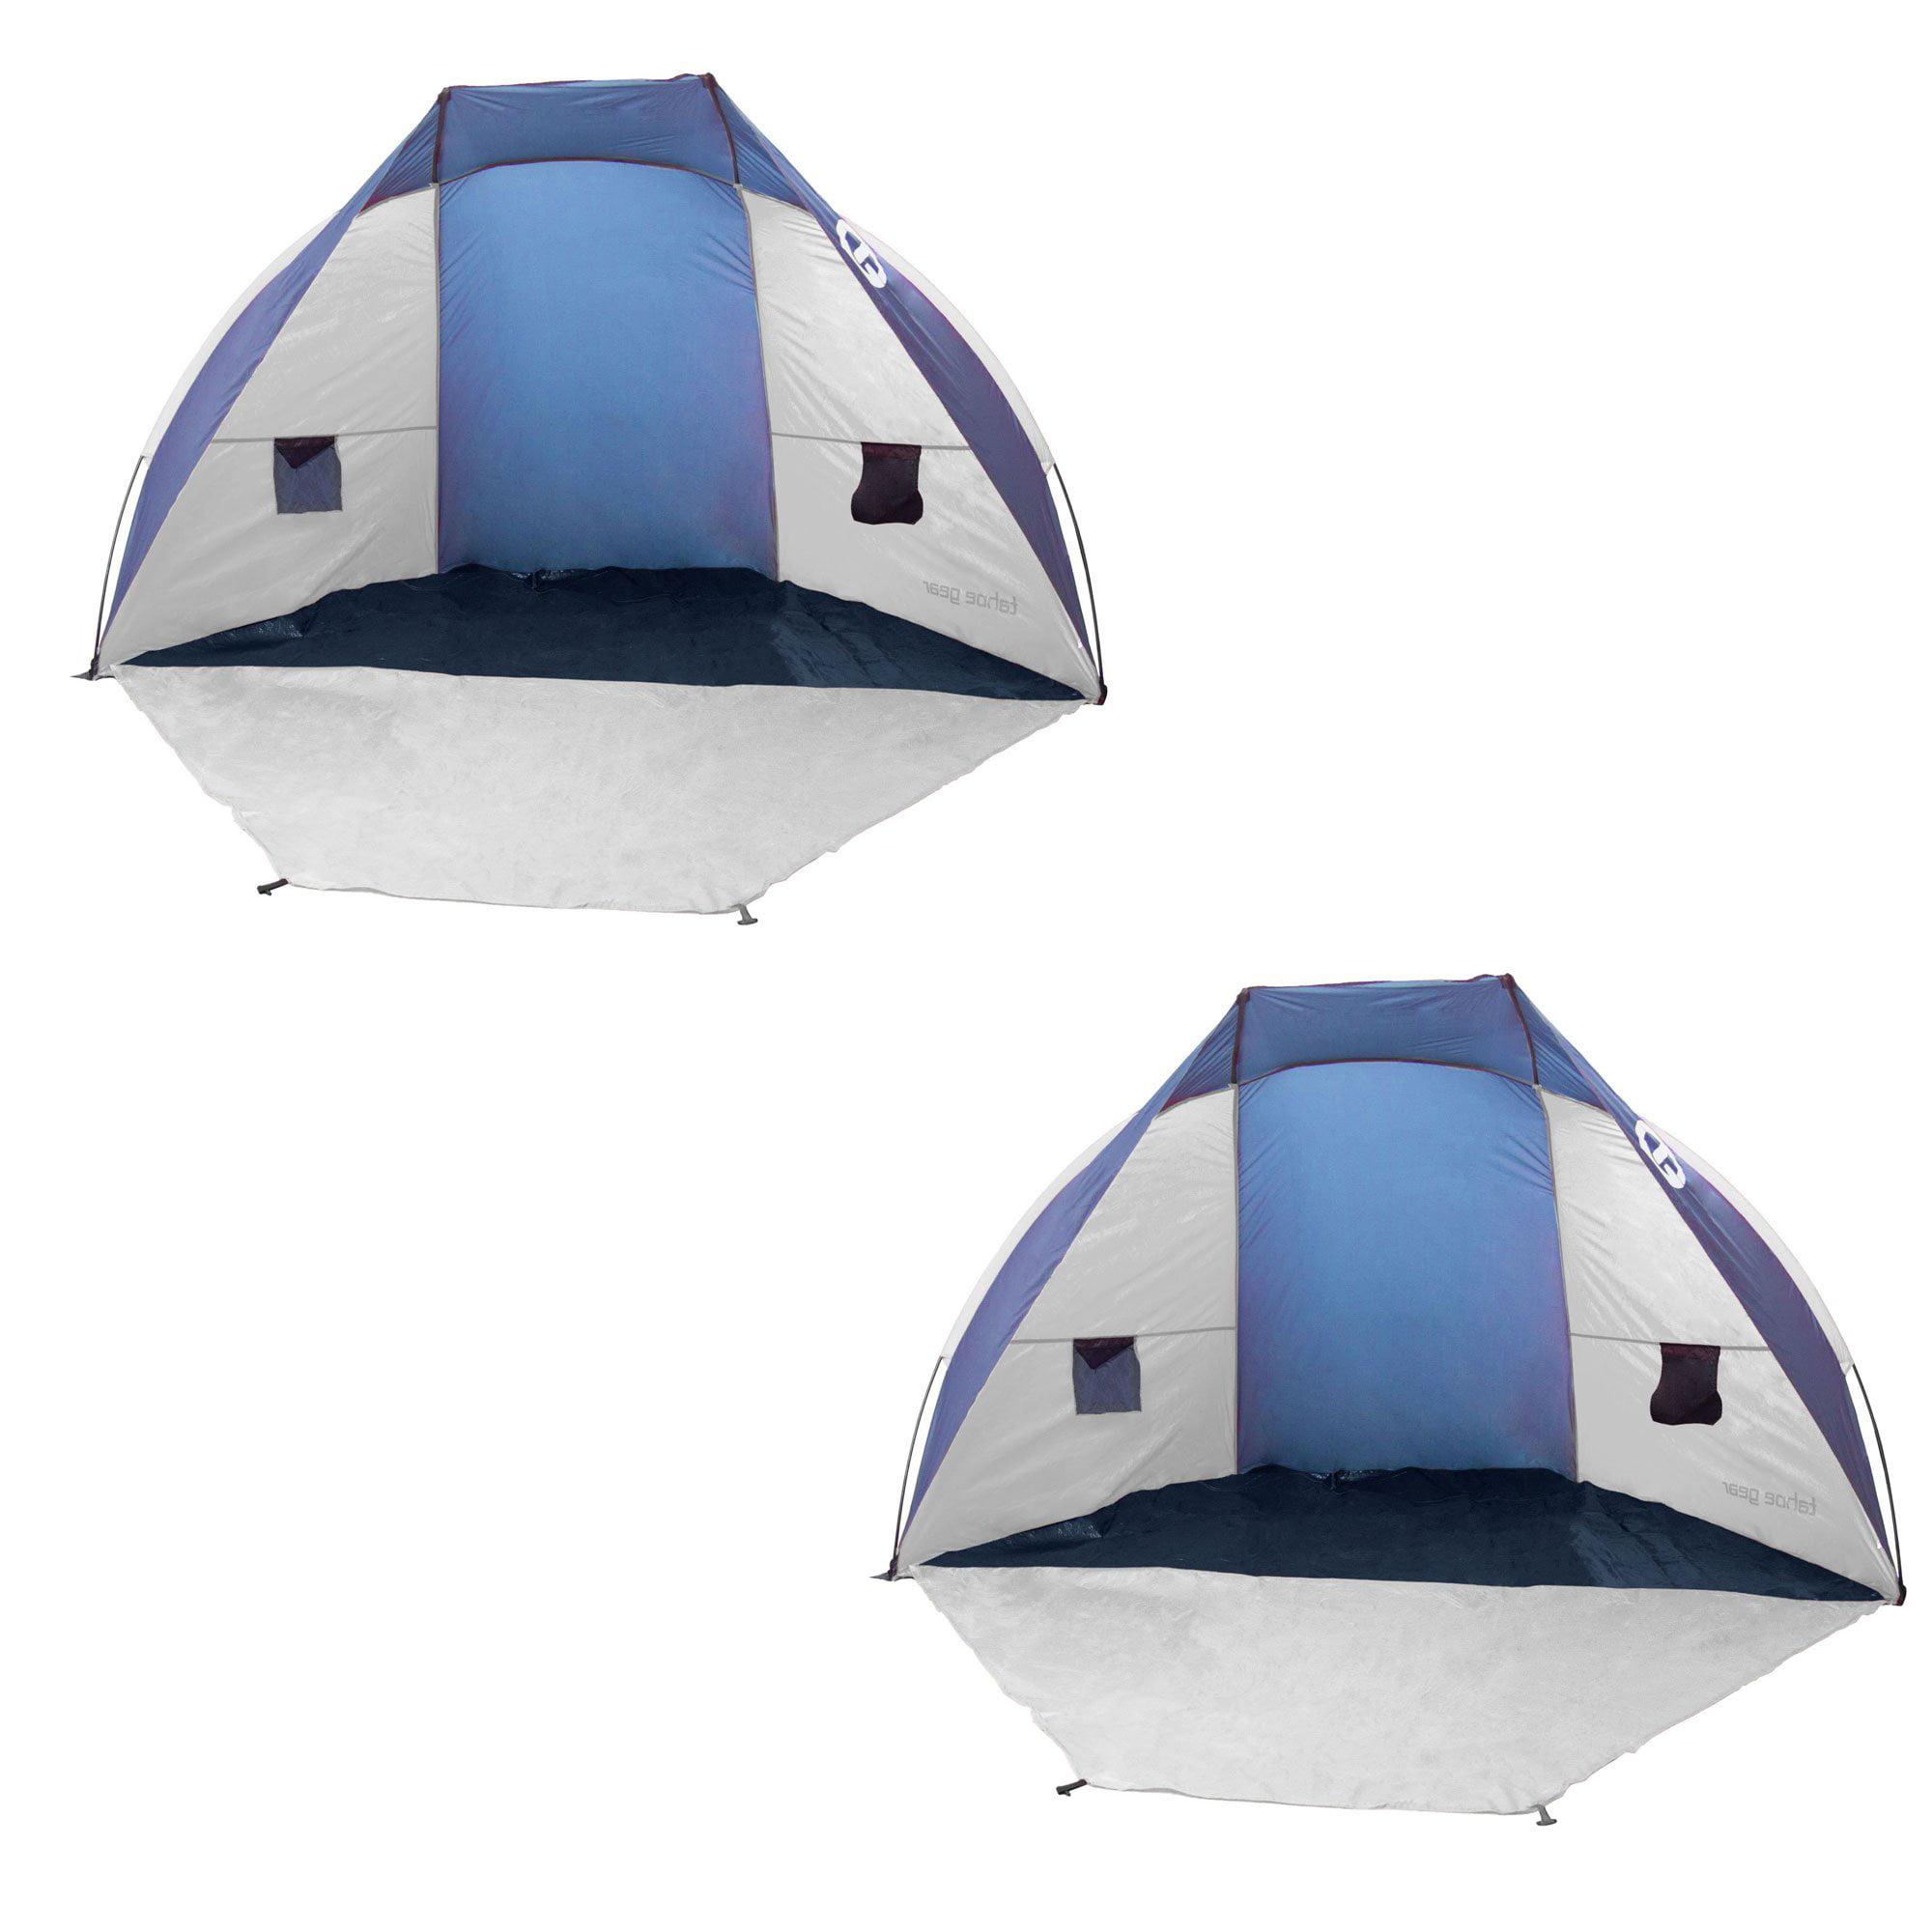 Tahoe Gear Cruz Bay Summer Sun Shelter and Beach Shade Tent Canopy (2 Pack)